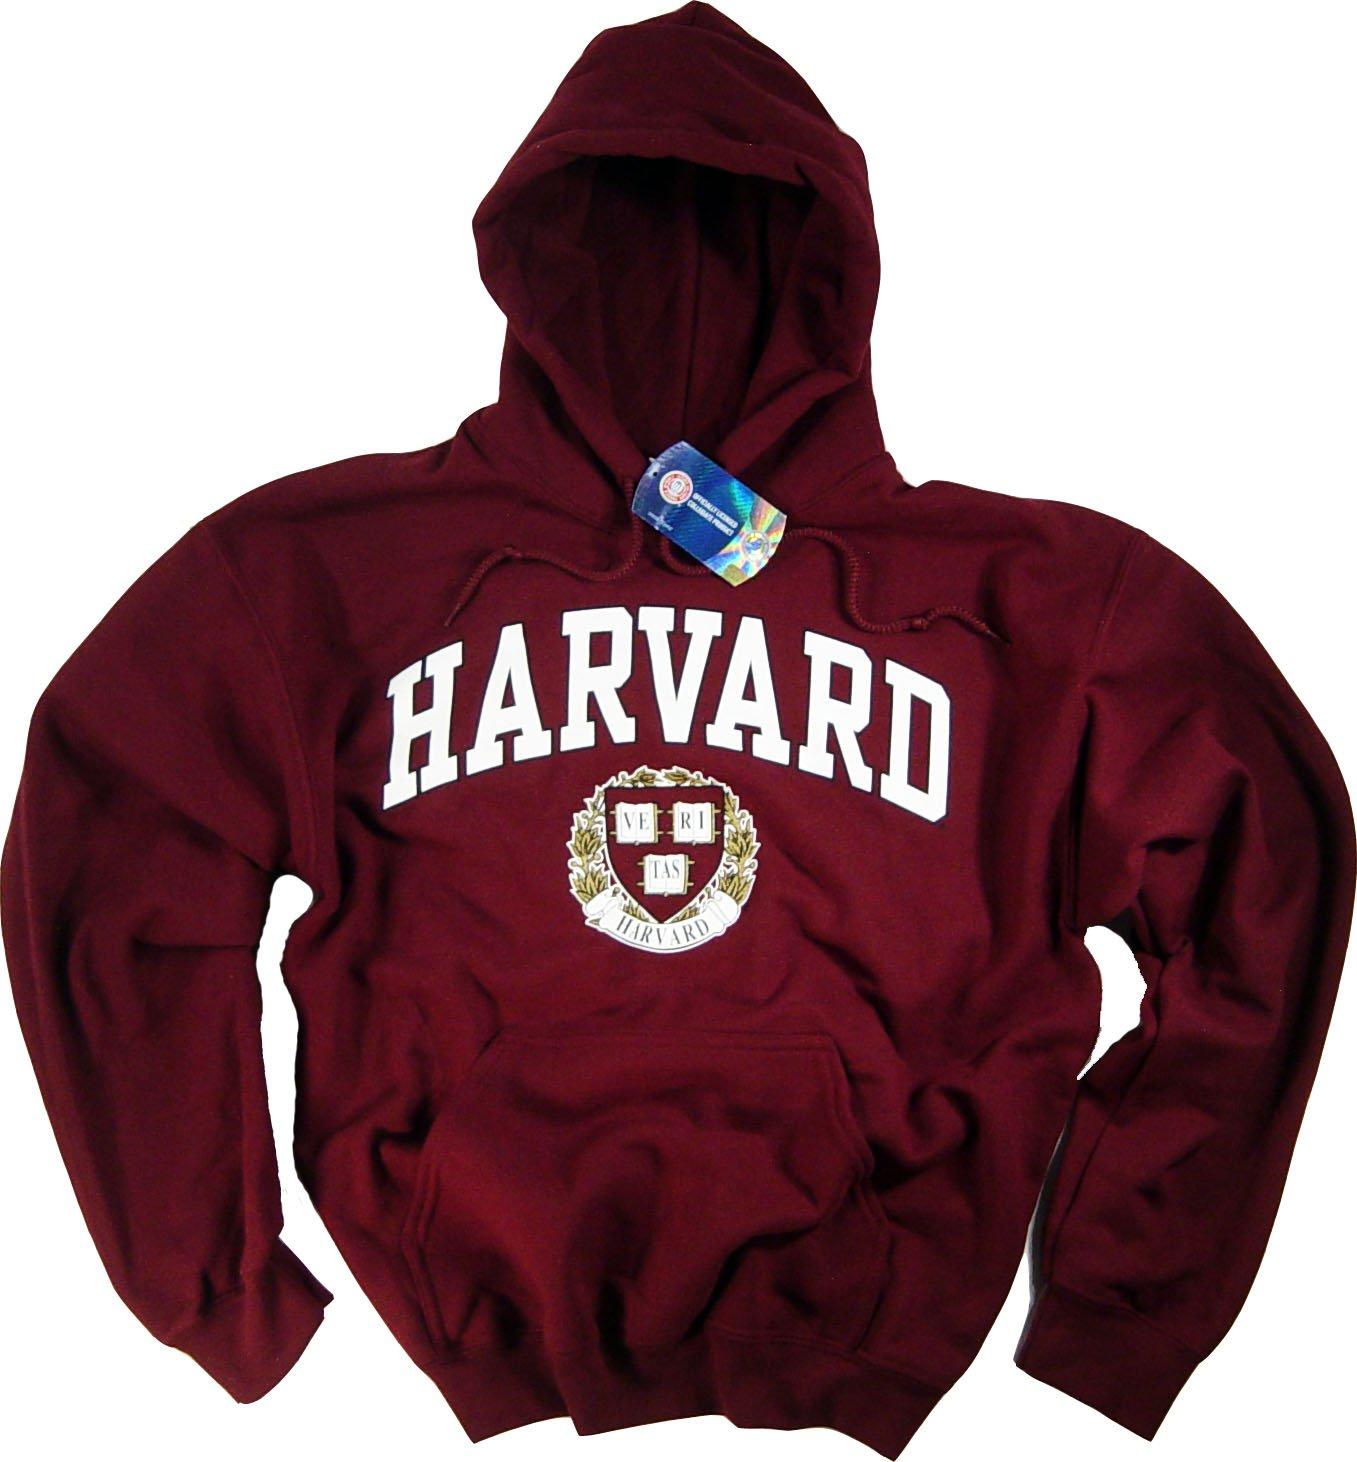 Anti Crime Harvard Shirt Hoodie Sweatshirt University T-Shirt Business Law Clothing Apparel (Medium)